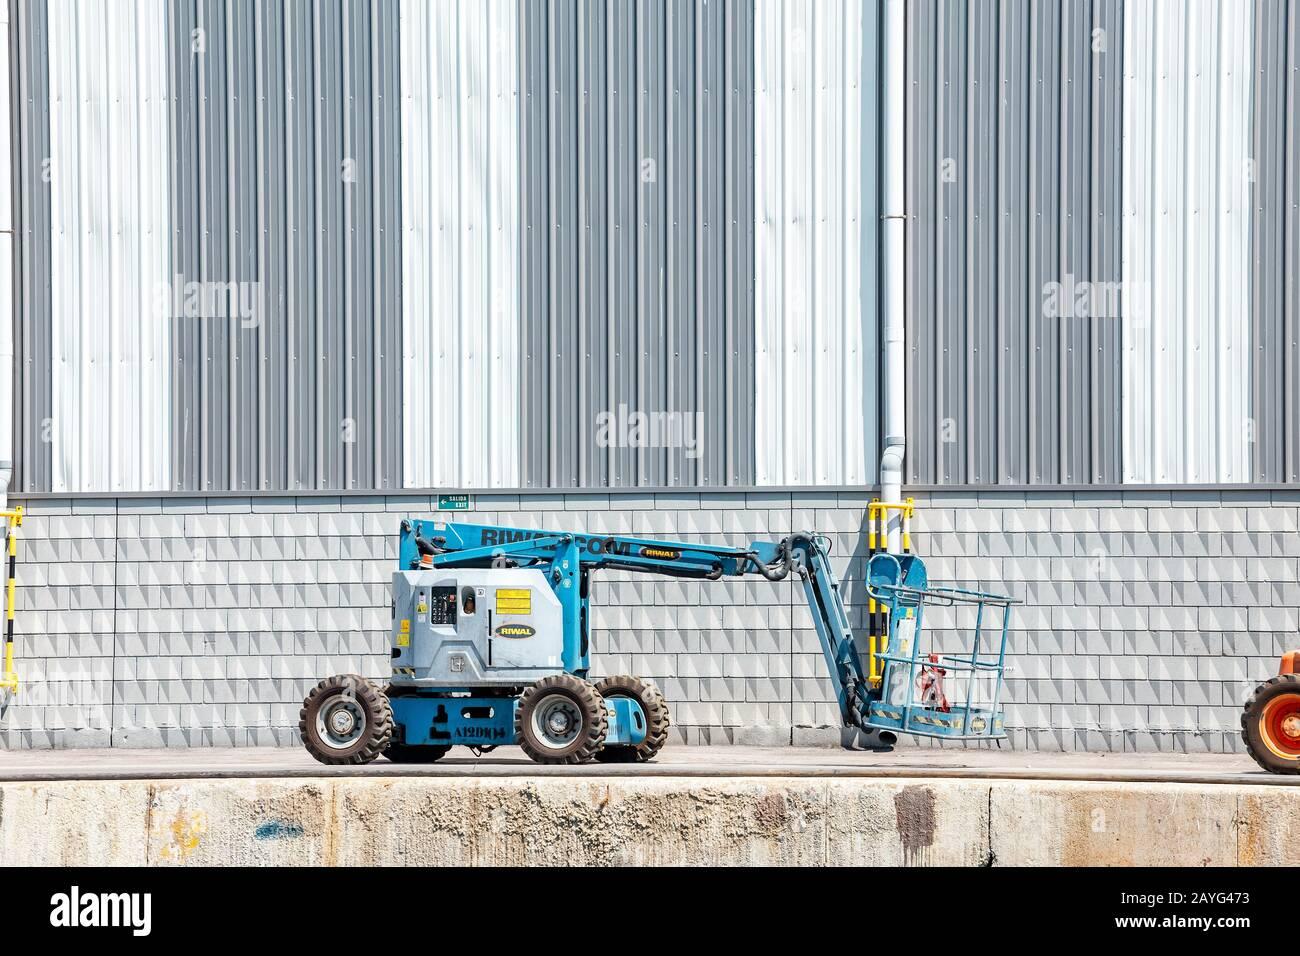 29 JULY 2018, BARCELONA, SPAIN: Telescopic elevator in industrial site Stock Photo